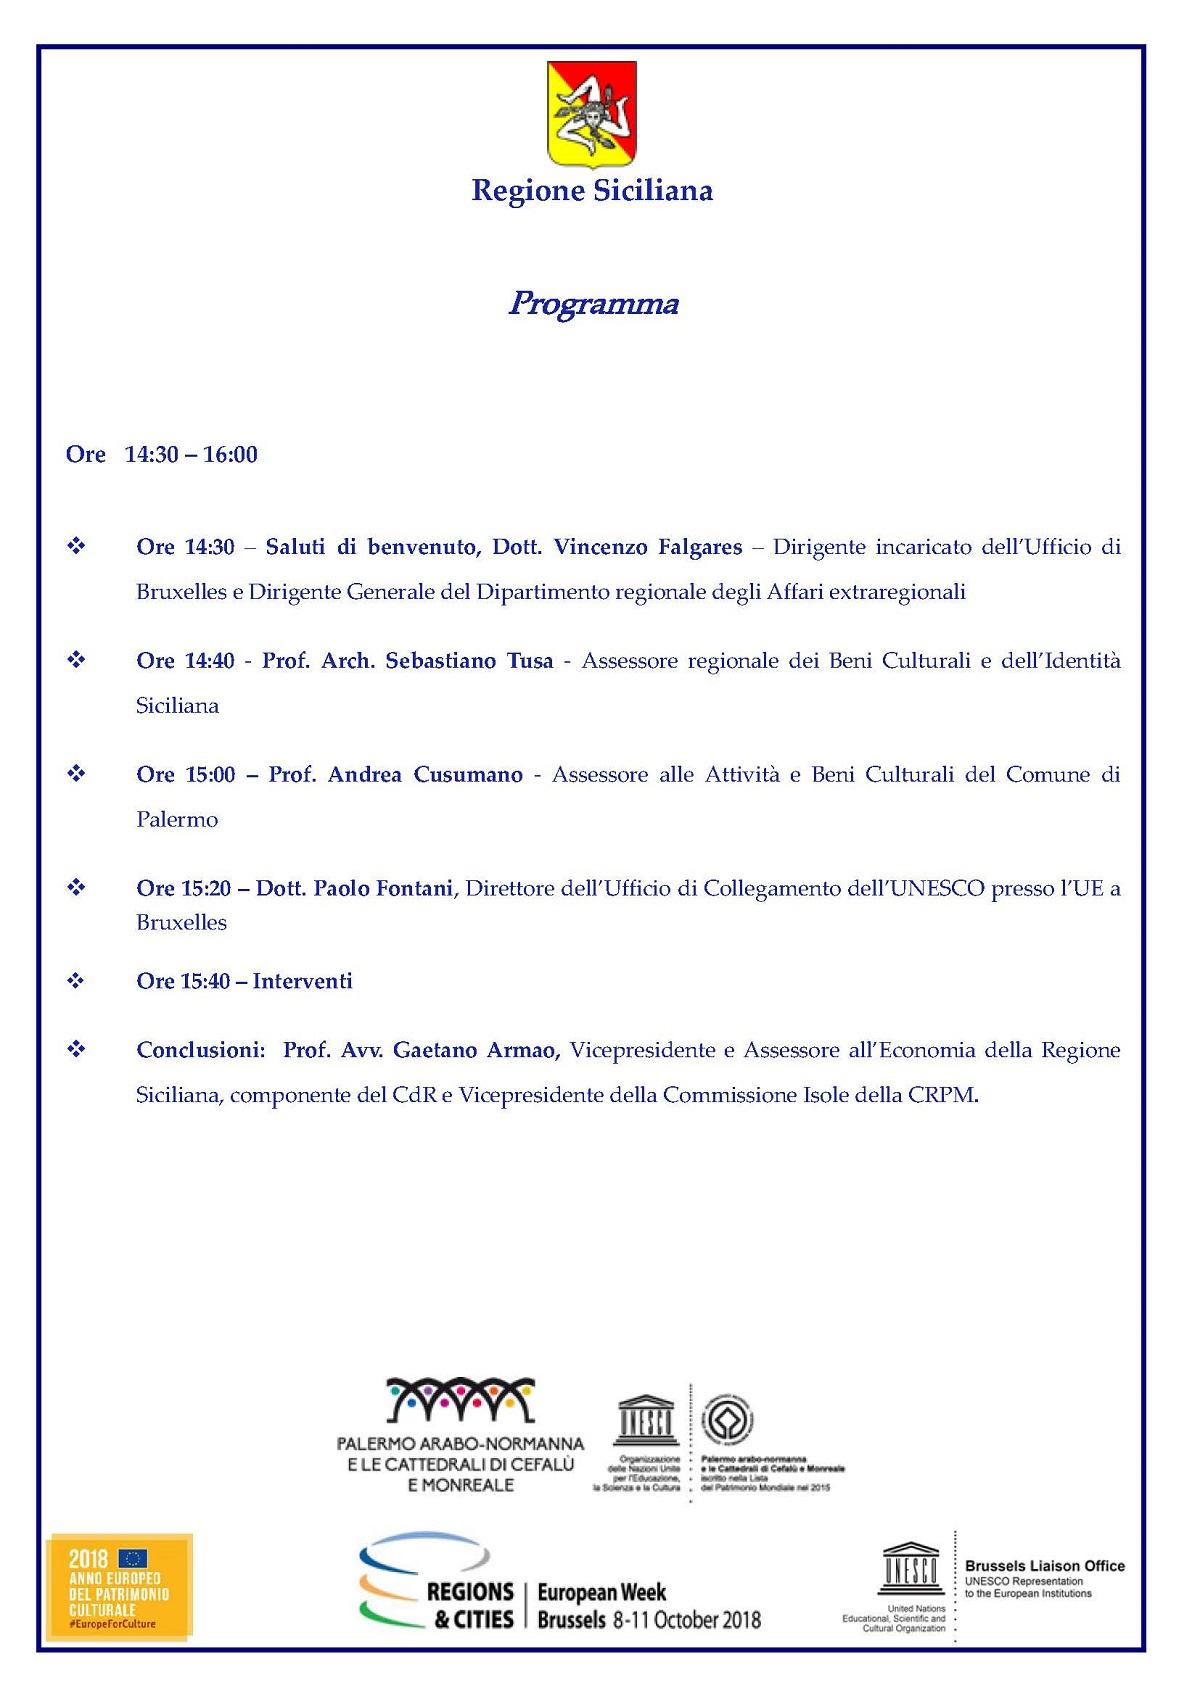 PROGRAMMA IN ITALIANO_Pagina_2